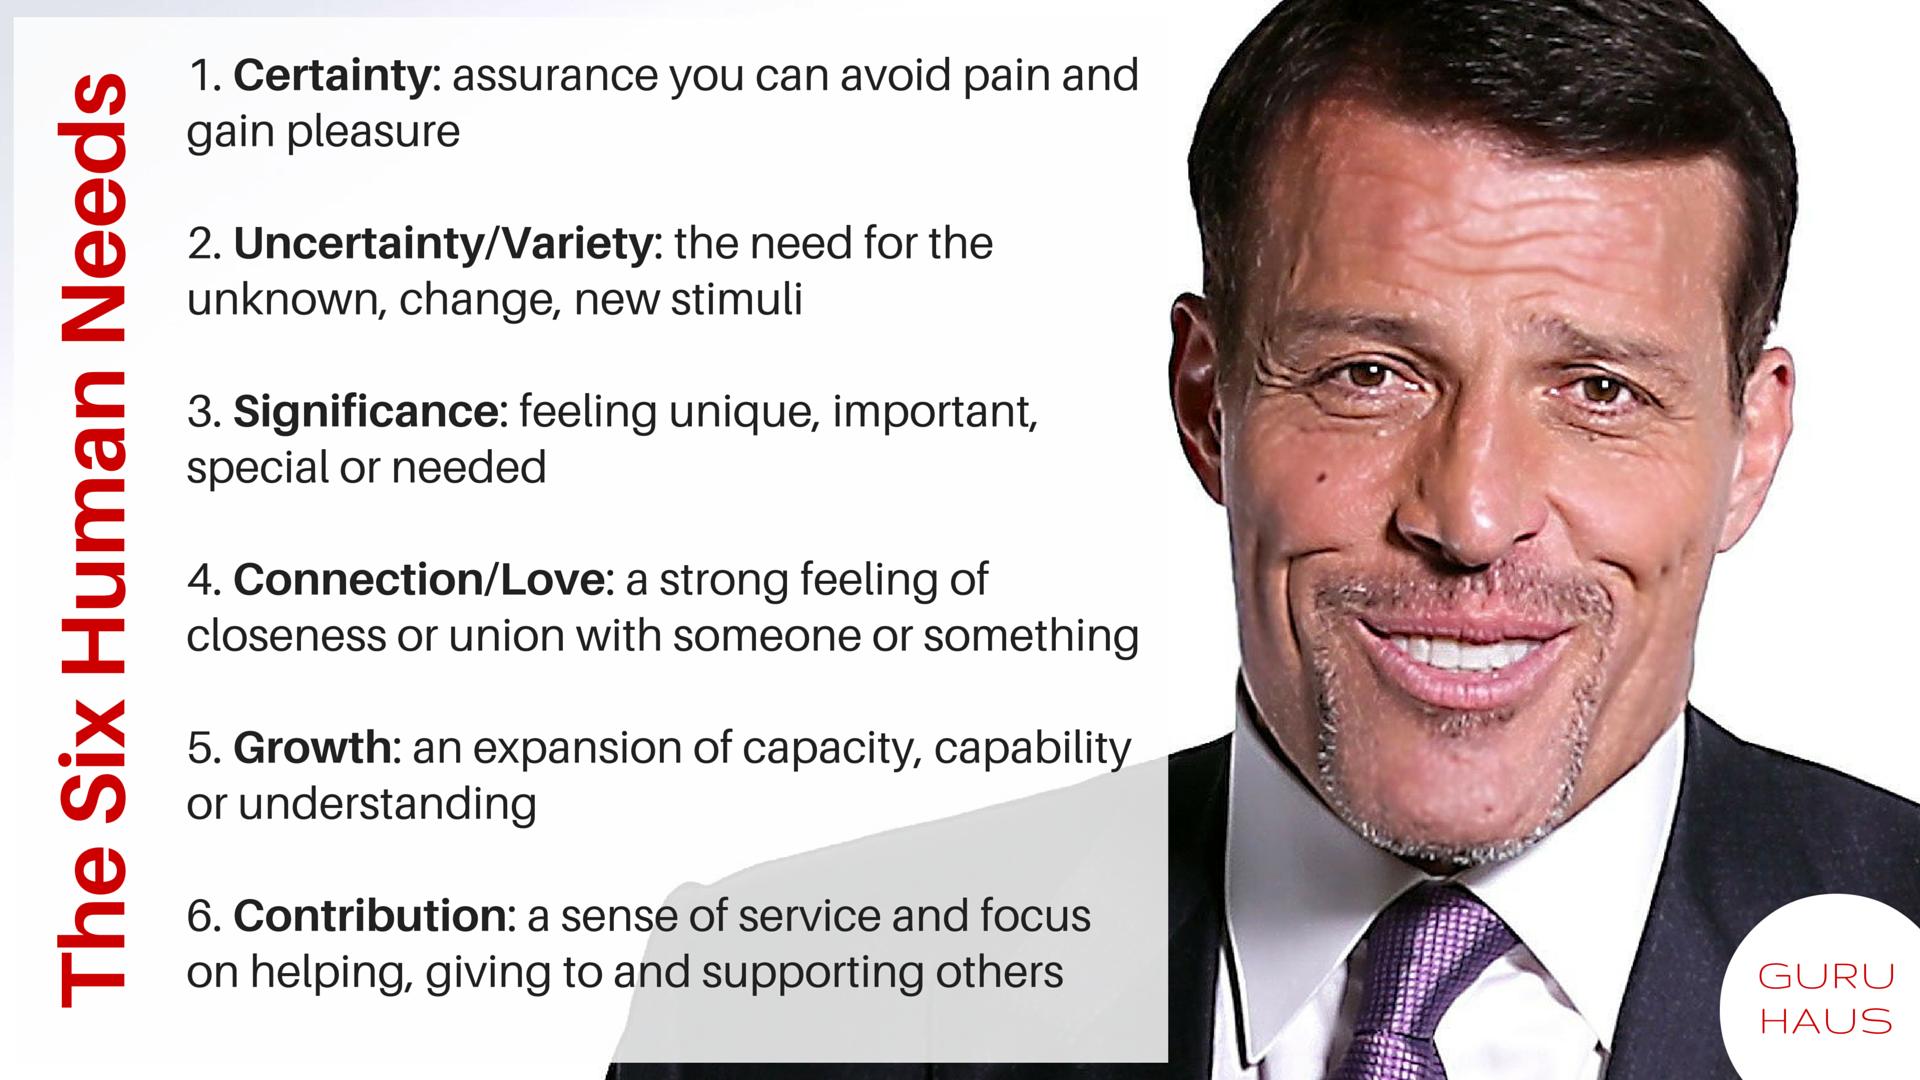 6 Human Needs According To Tony Robbins